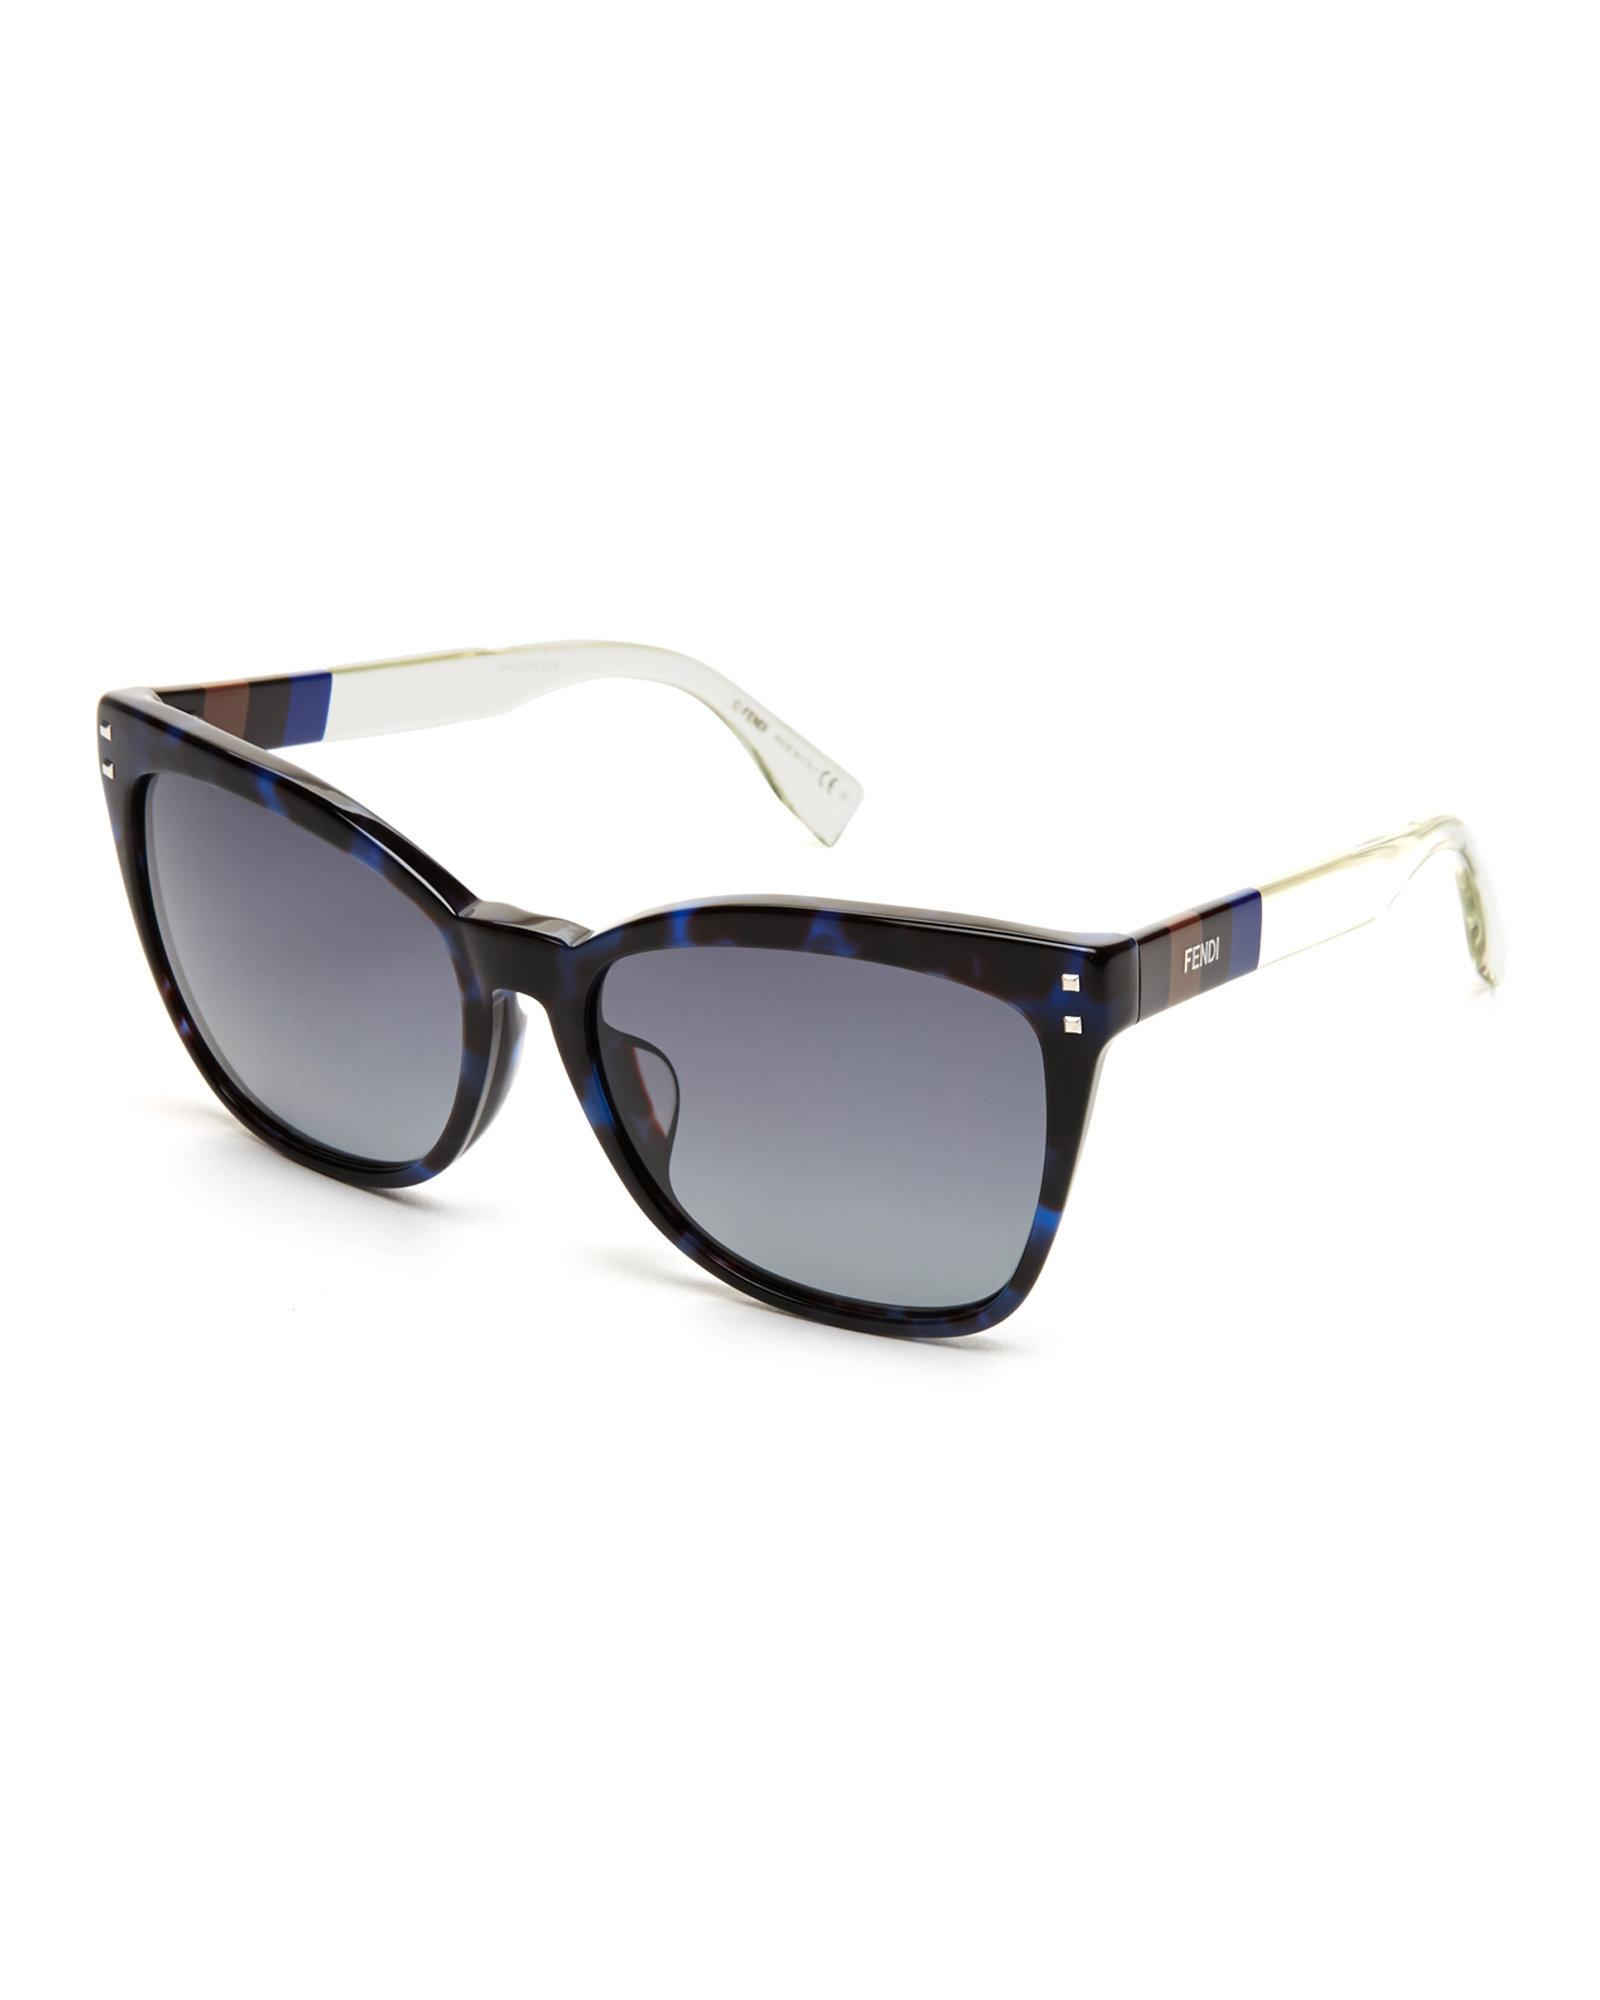 ab613fb3b0676 Fendi Ff0098 Blue   White Cat Eye Sunglasses in Blue